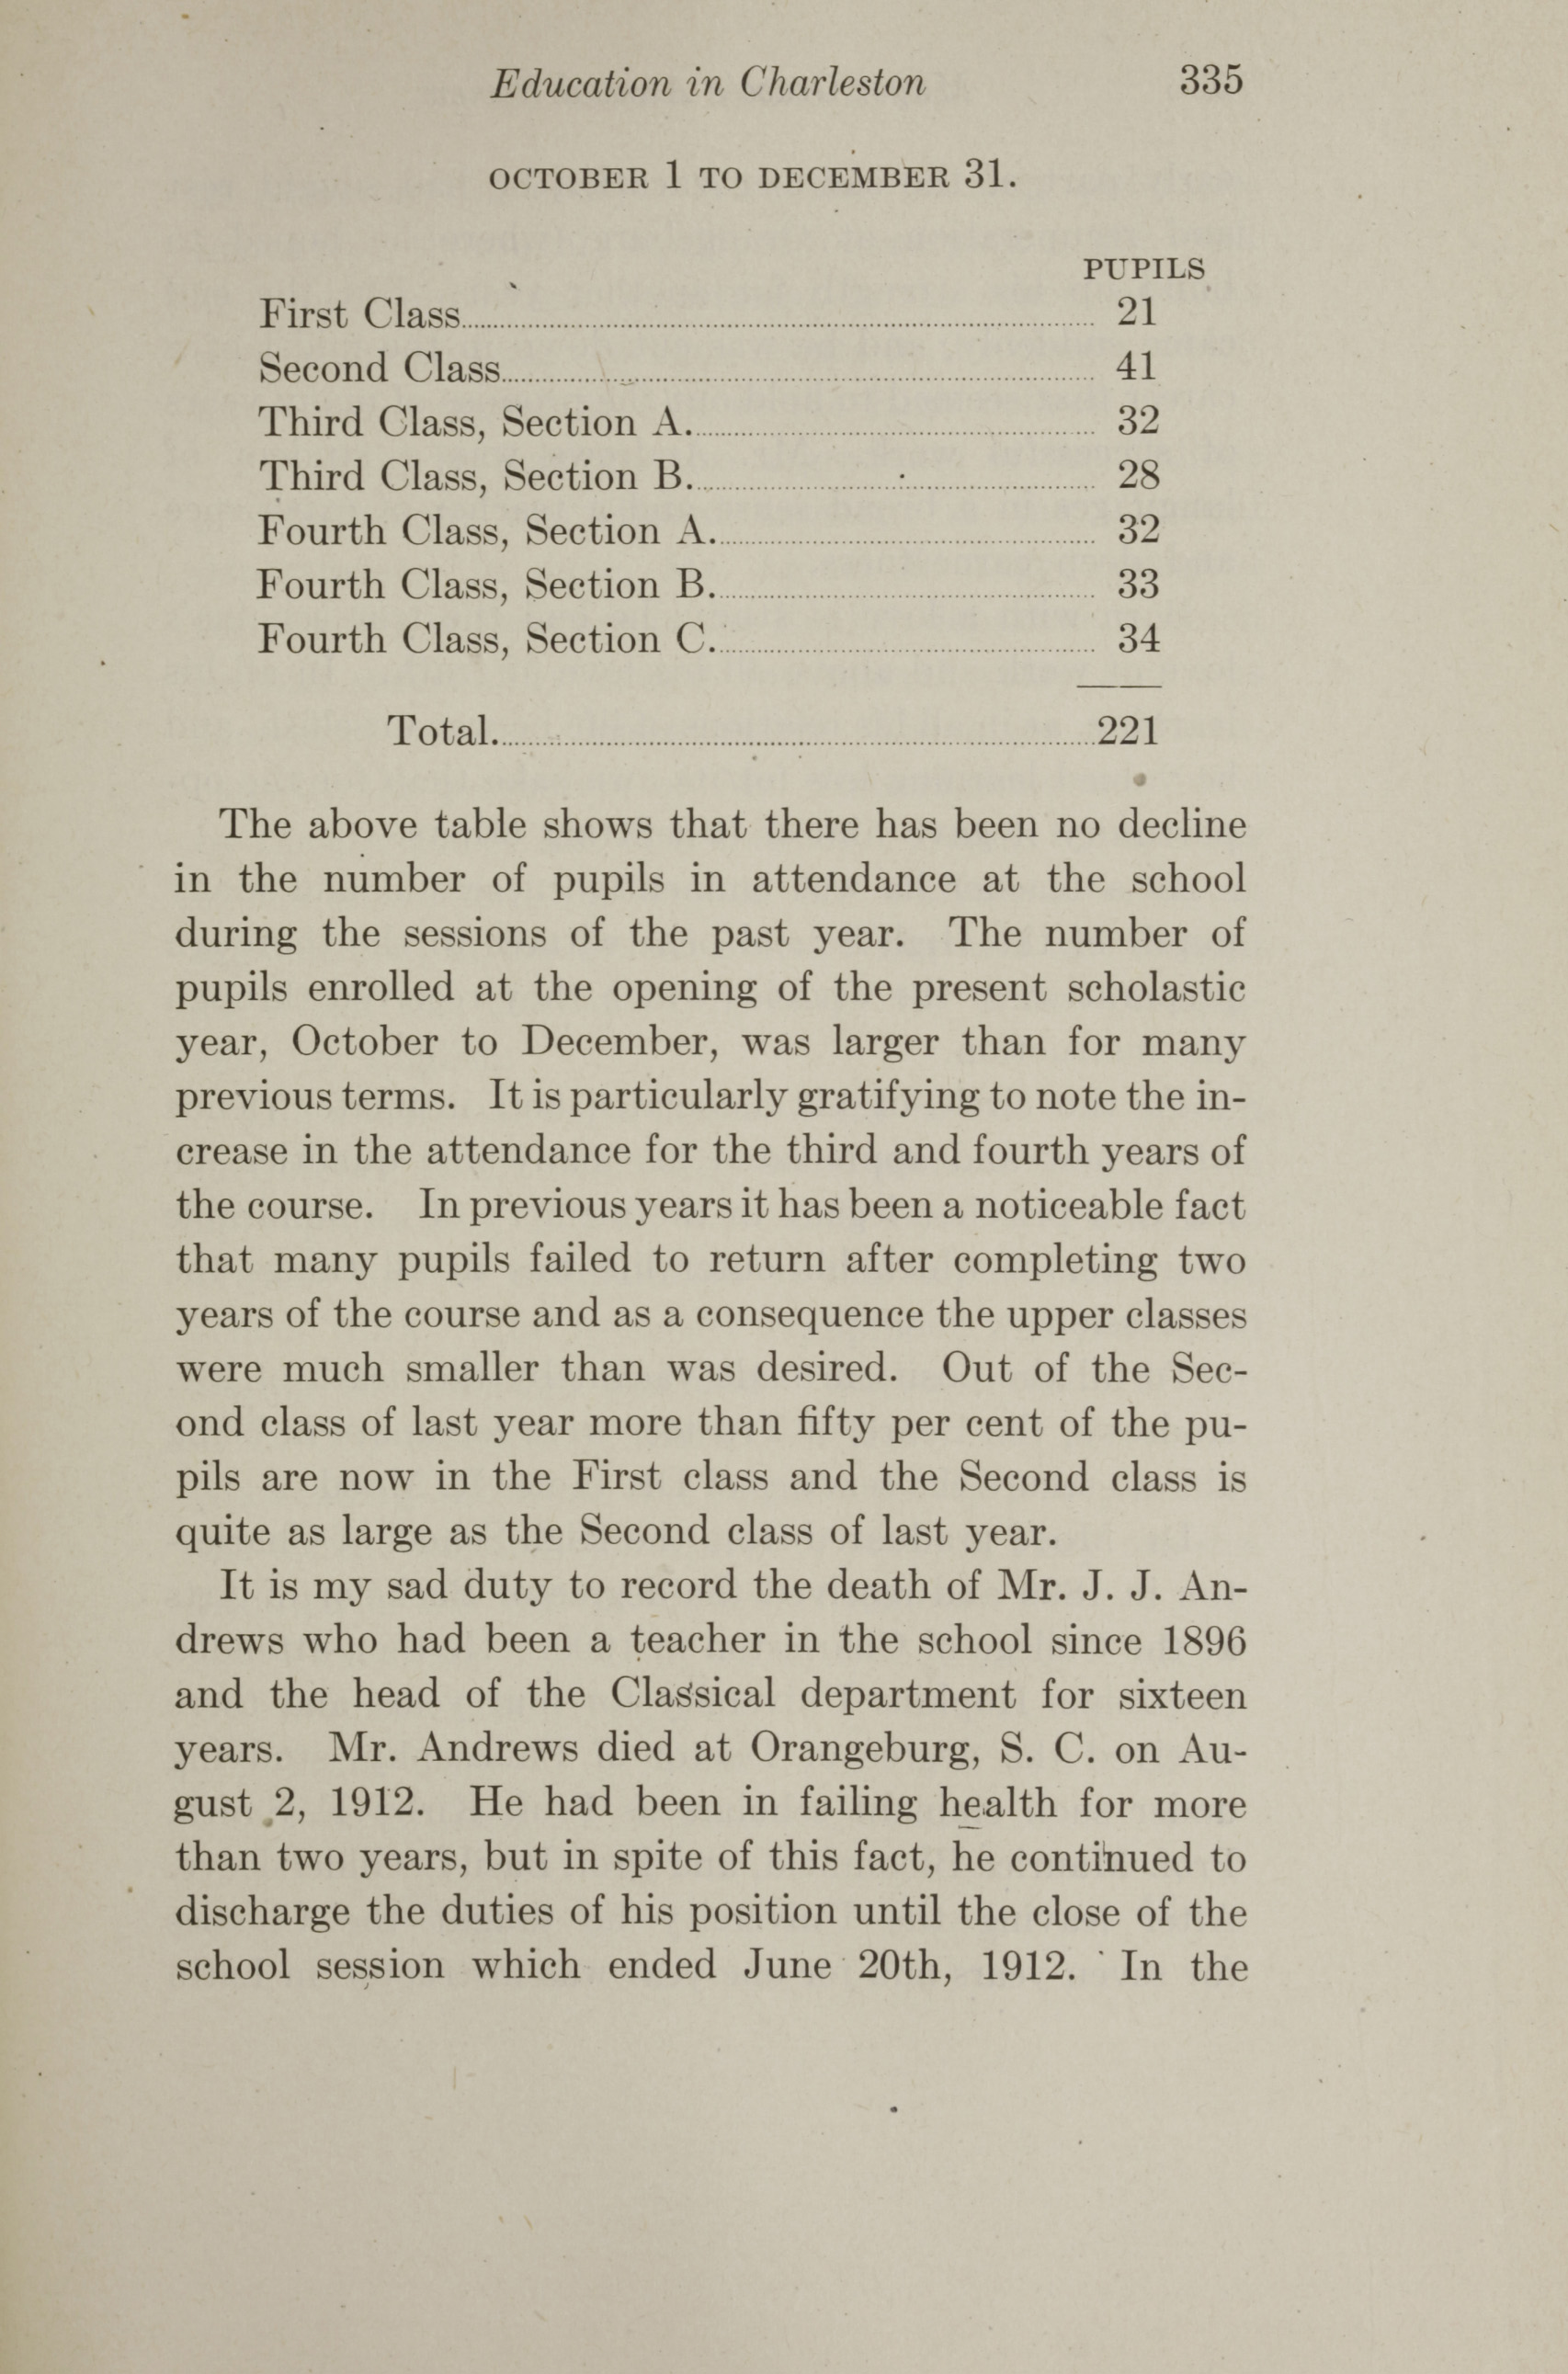 Charleston Yearbook, 1912, page 335